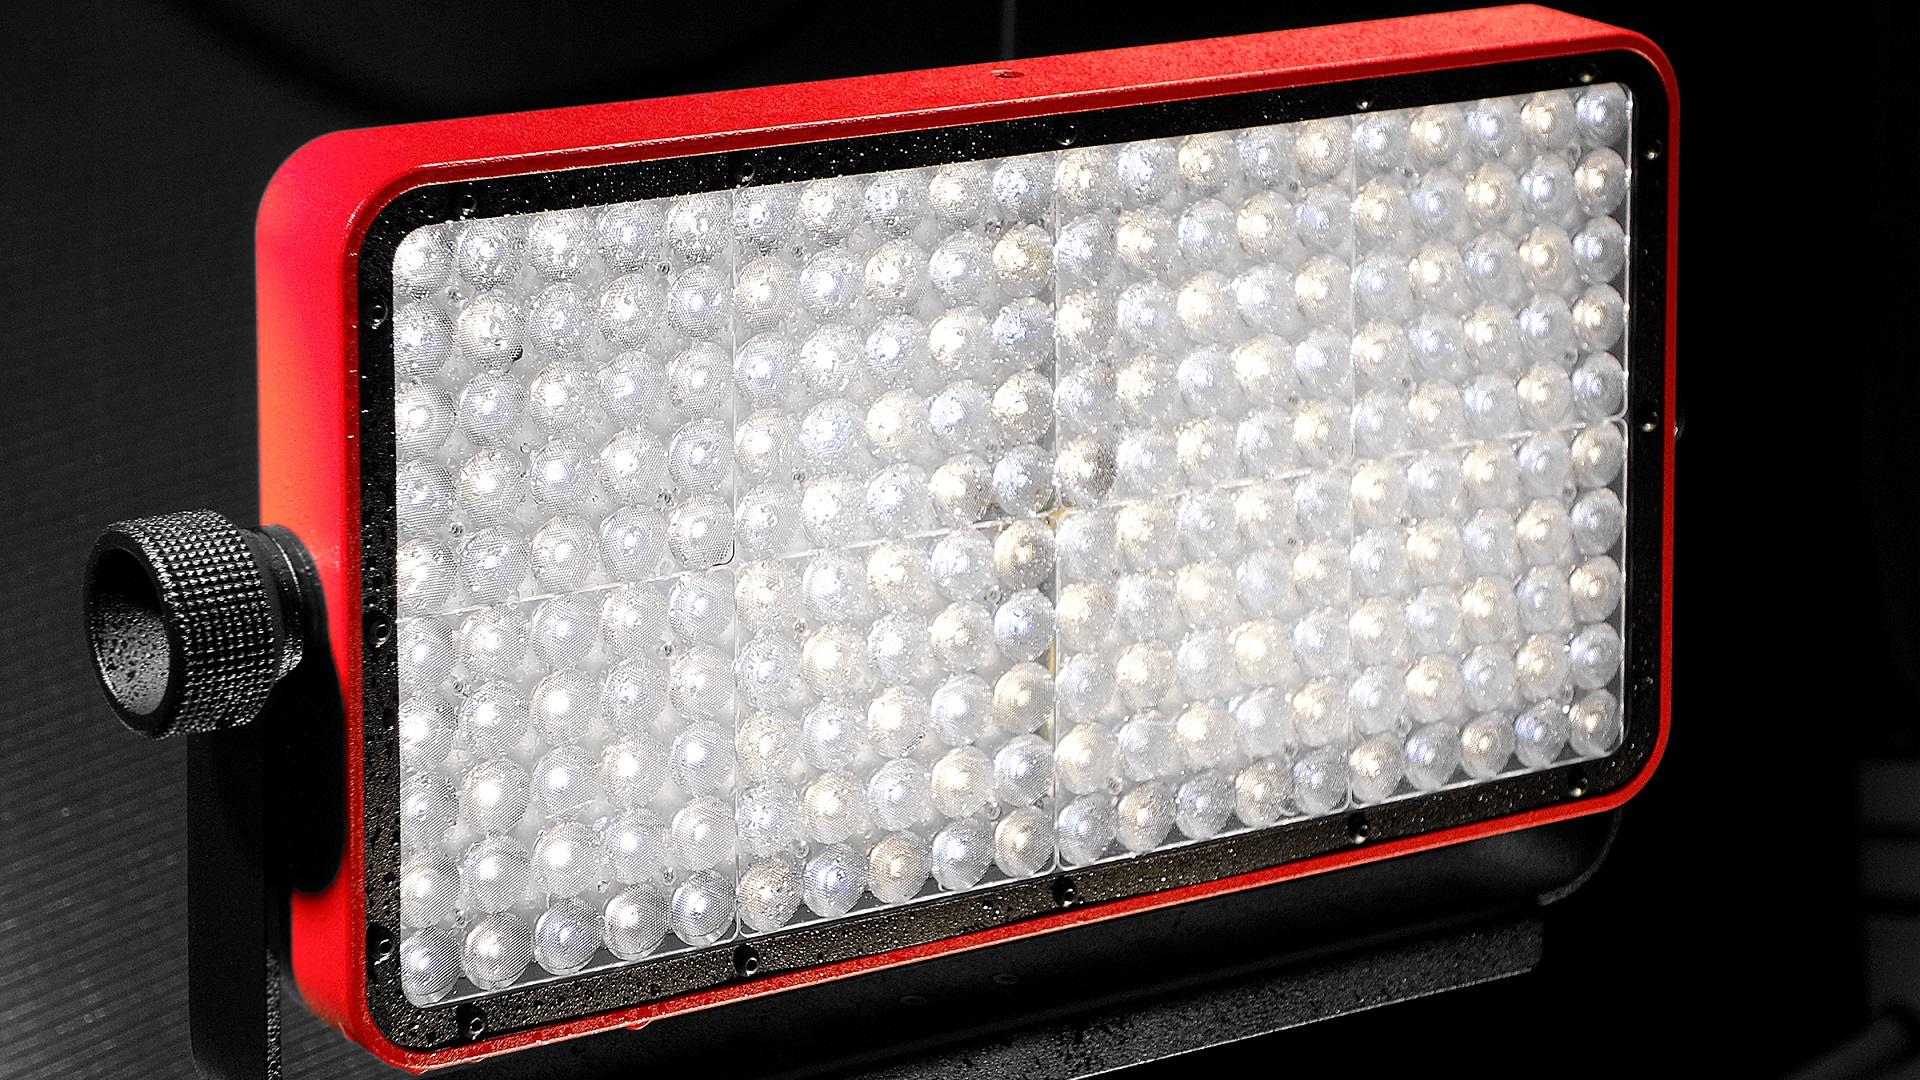 KinotehnikがPractilite 802 LEDライトを発表